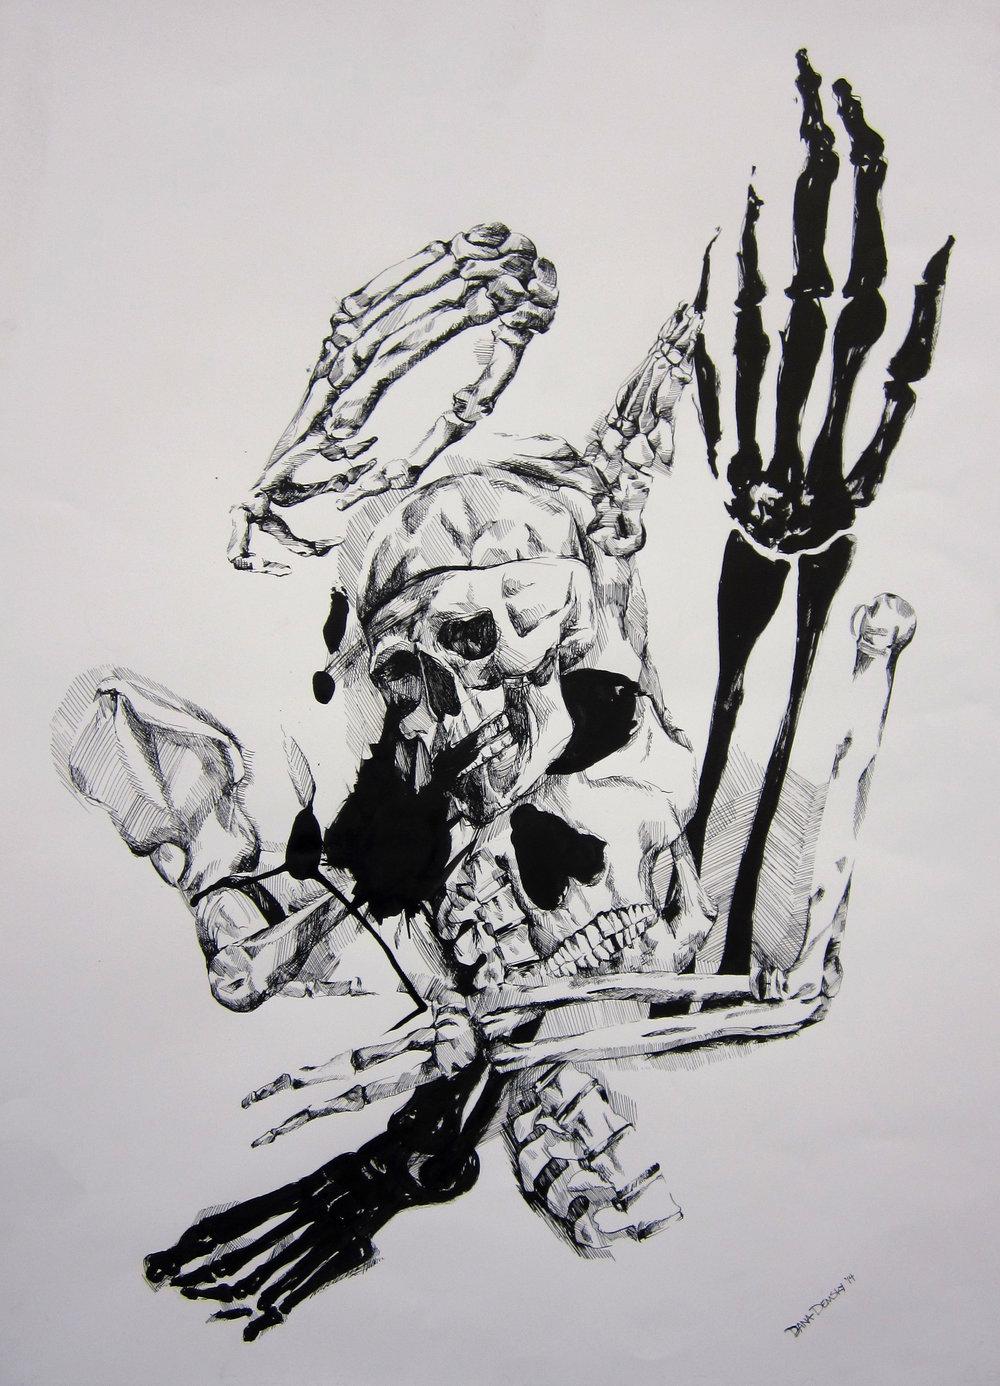 Skeleton Juxtaposition, india ink